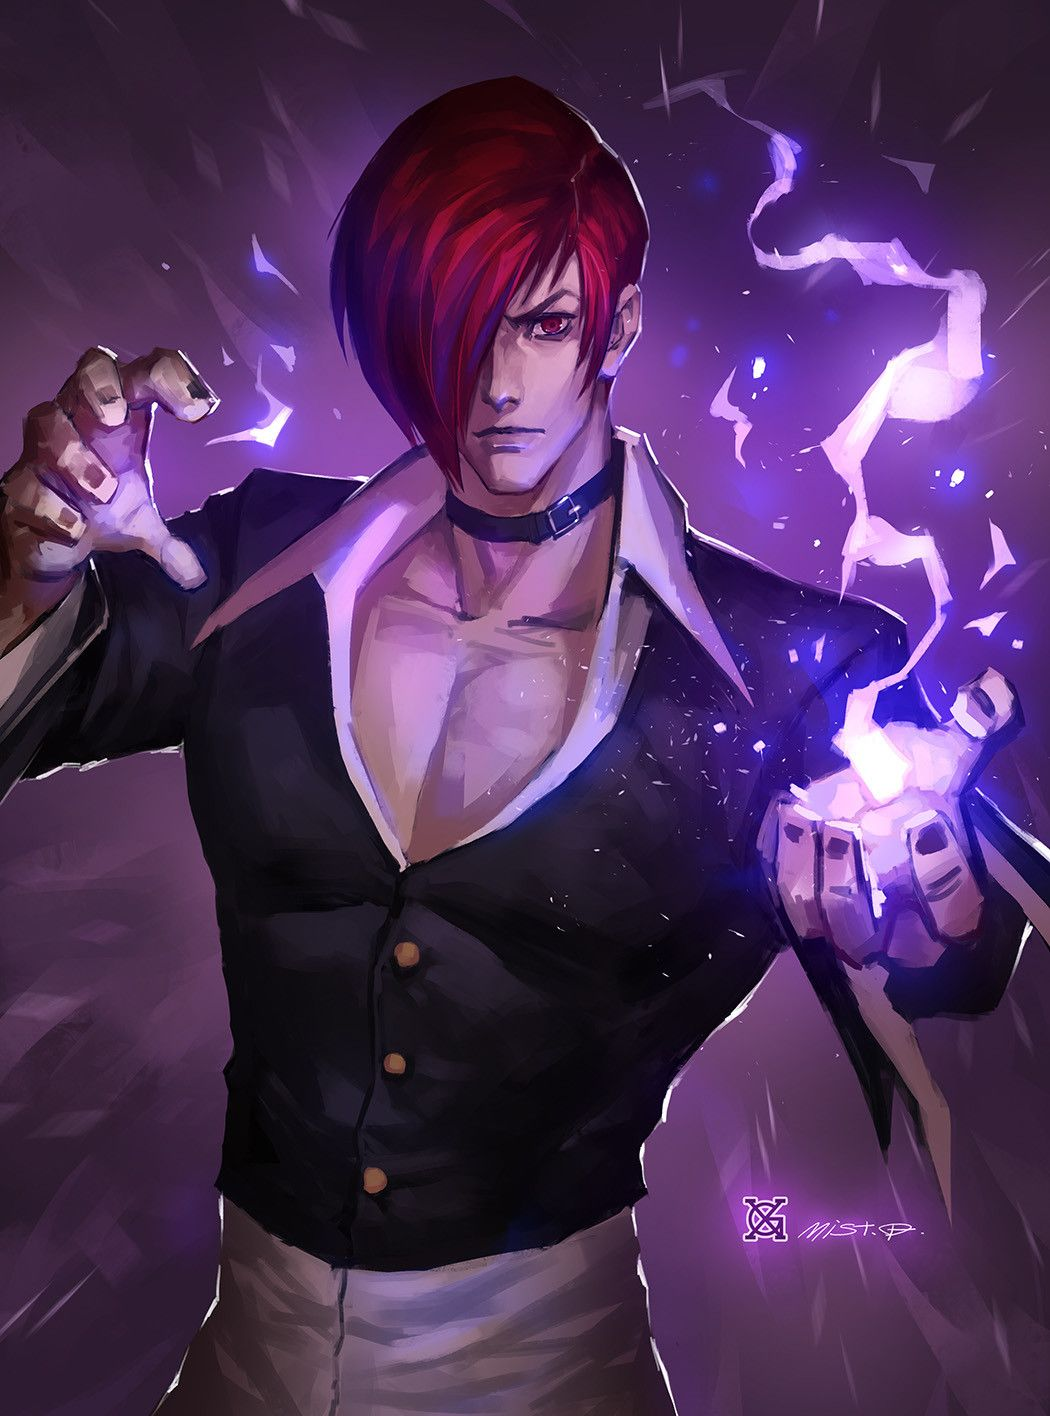 Iori Mist Xg King Of Fighters Hero Fighter Fighter